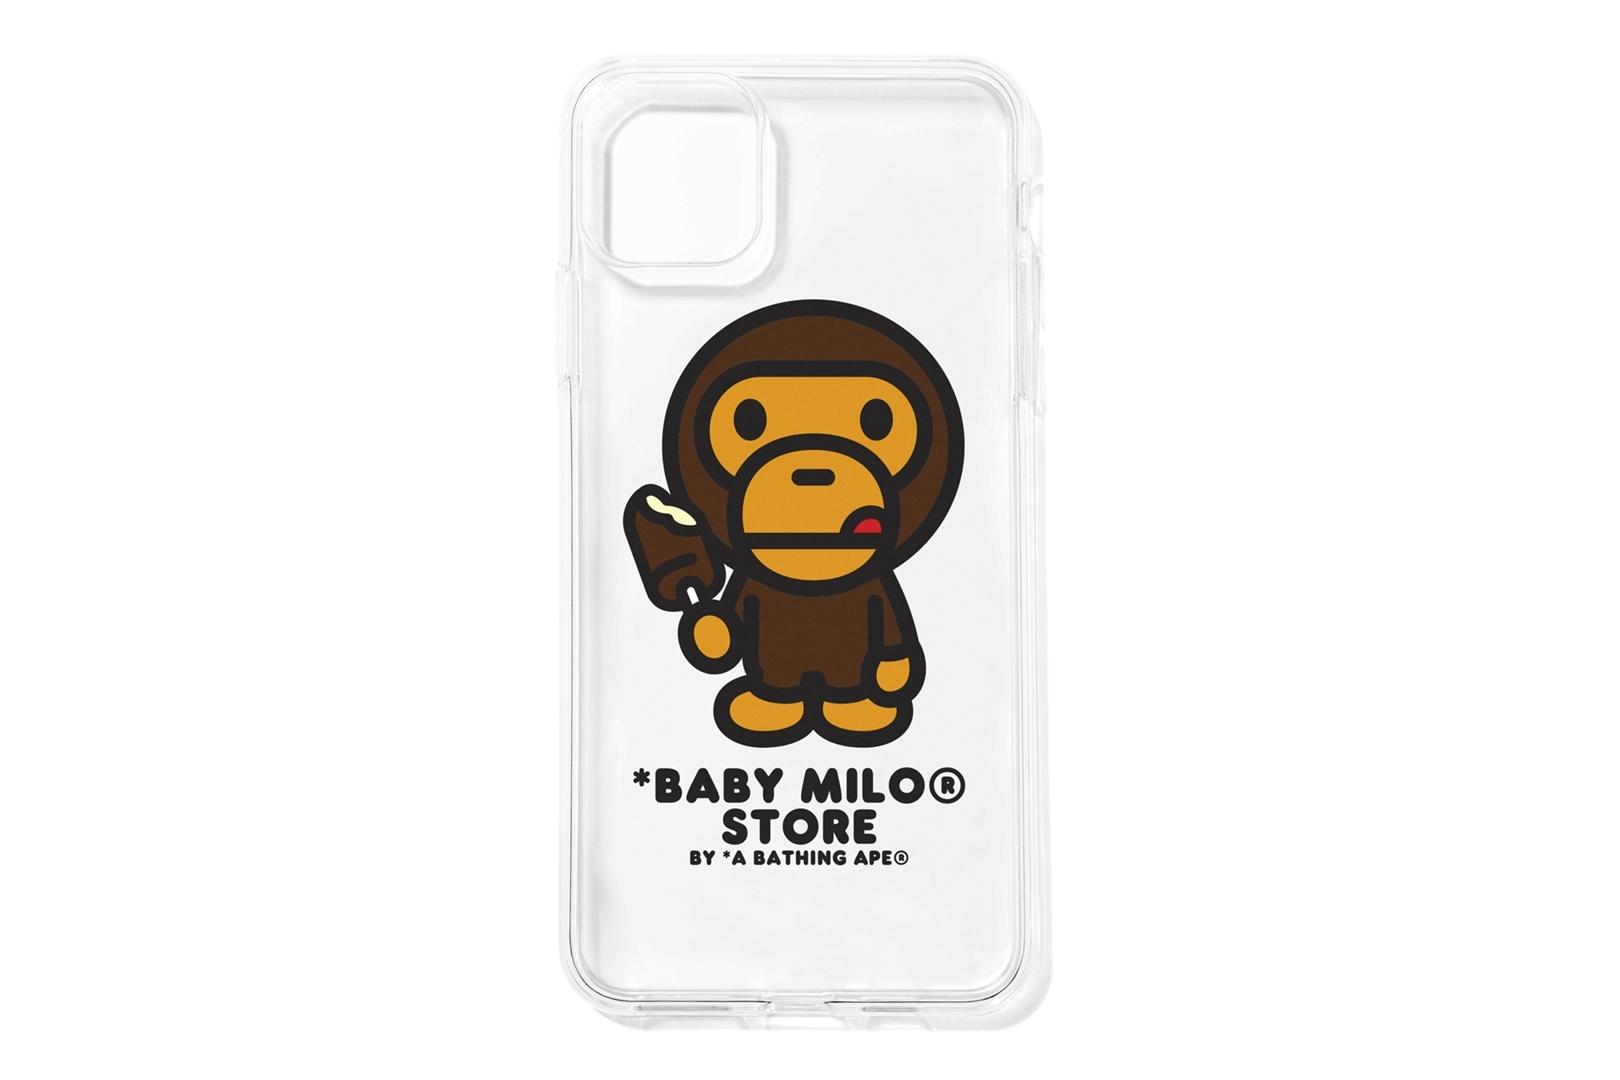 BABY MILO® iPhone 11 PRO MAX SOFT CASE #1_a0174495_13455752.jpg